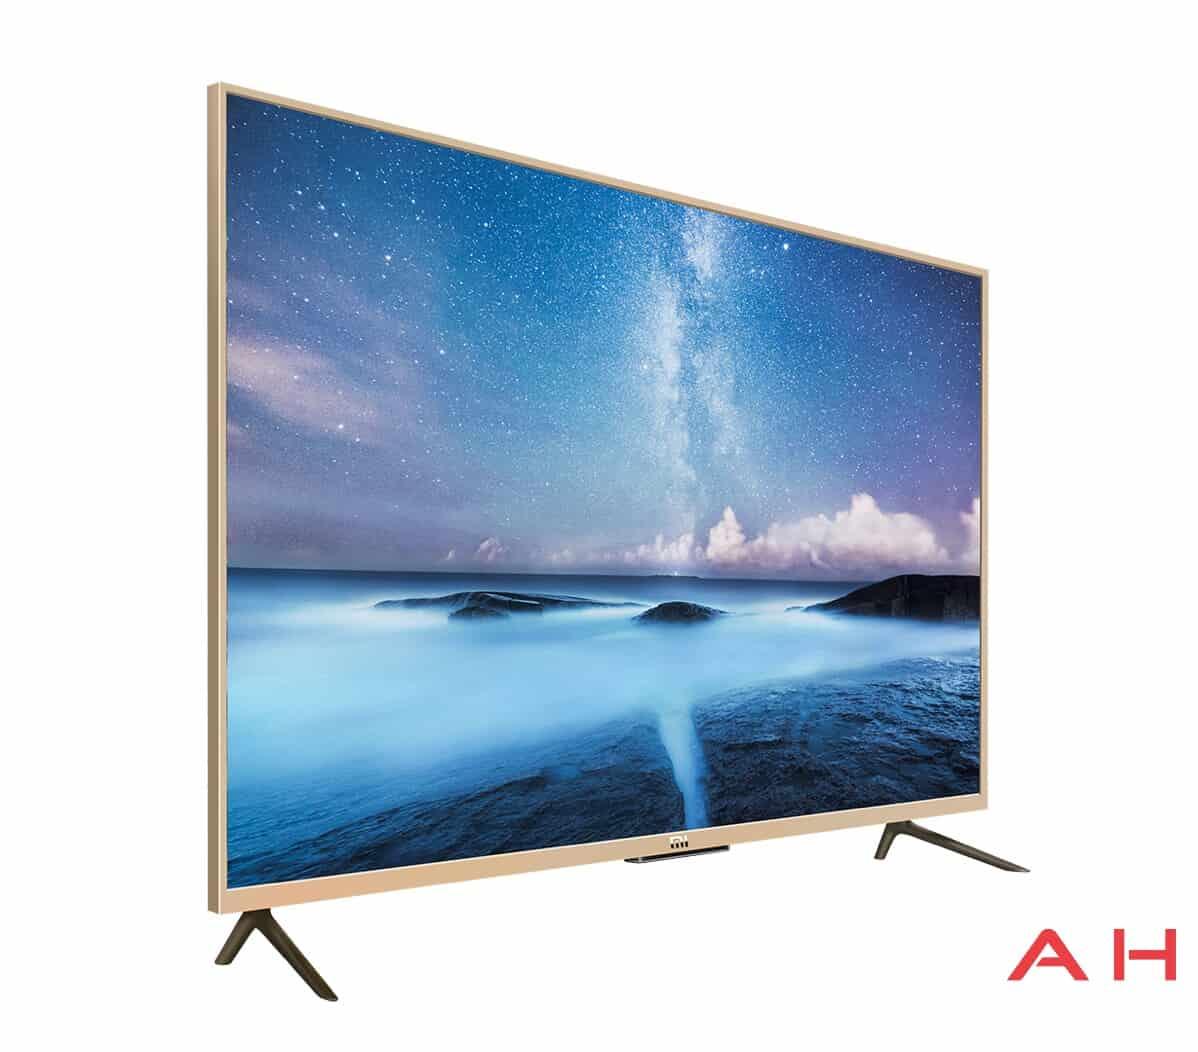 AH Mi TV 2 55 inch 2015 4